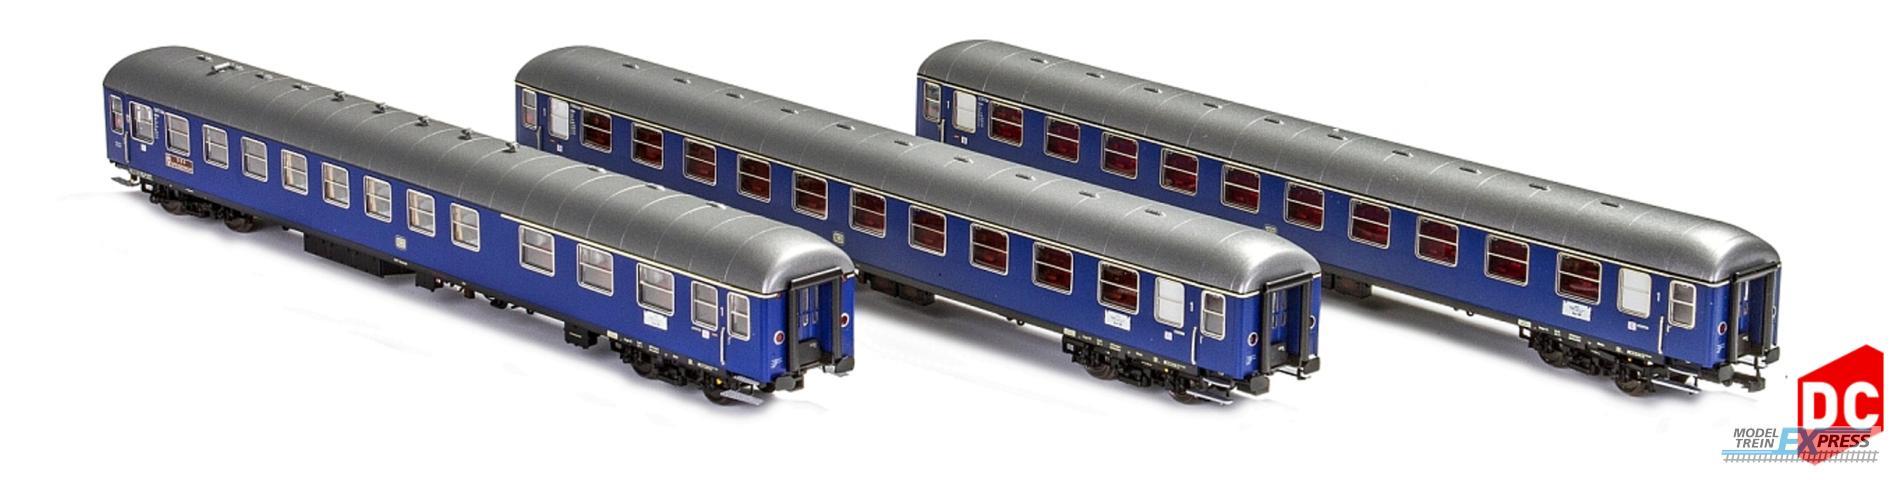 Hobbytrain 43022